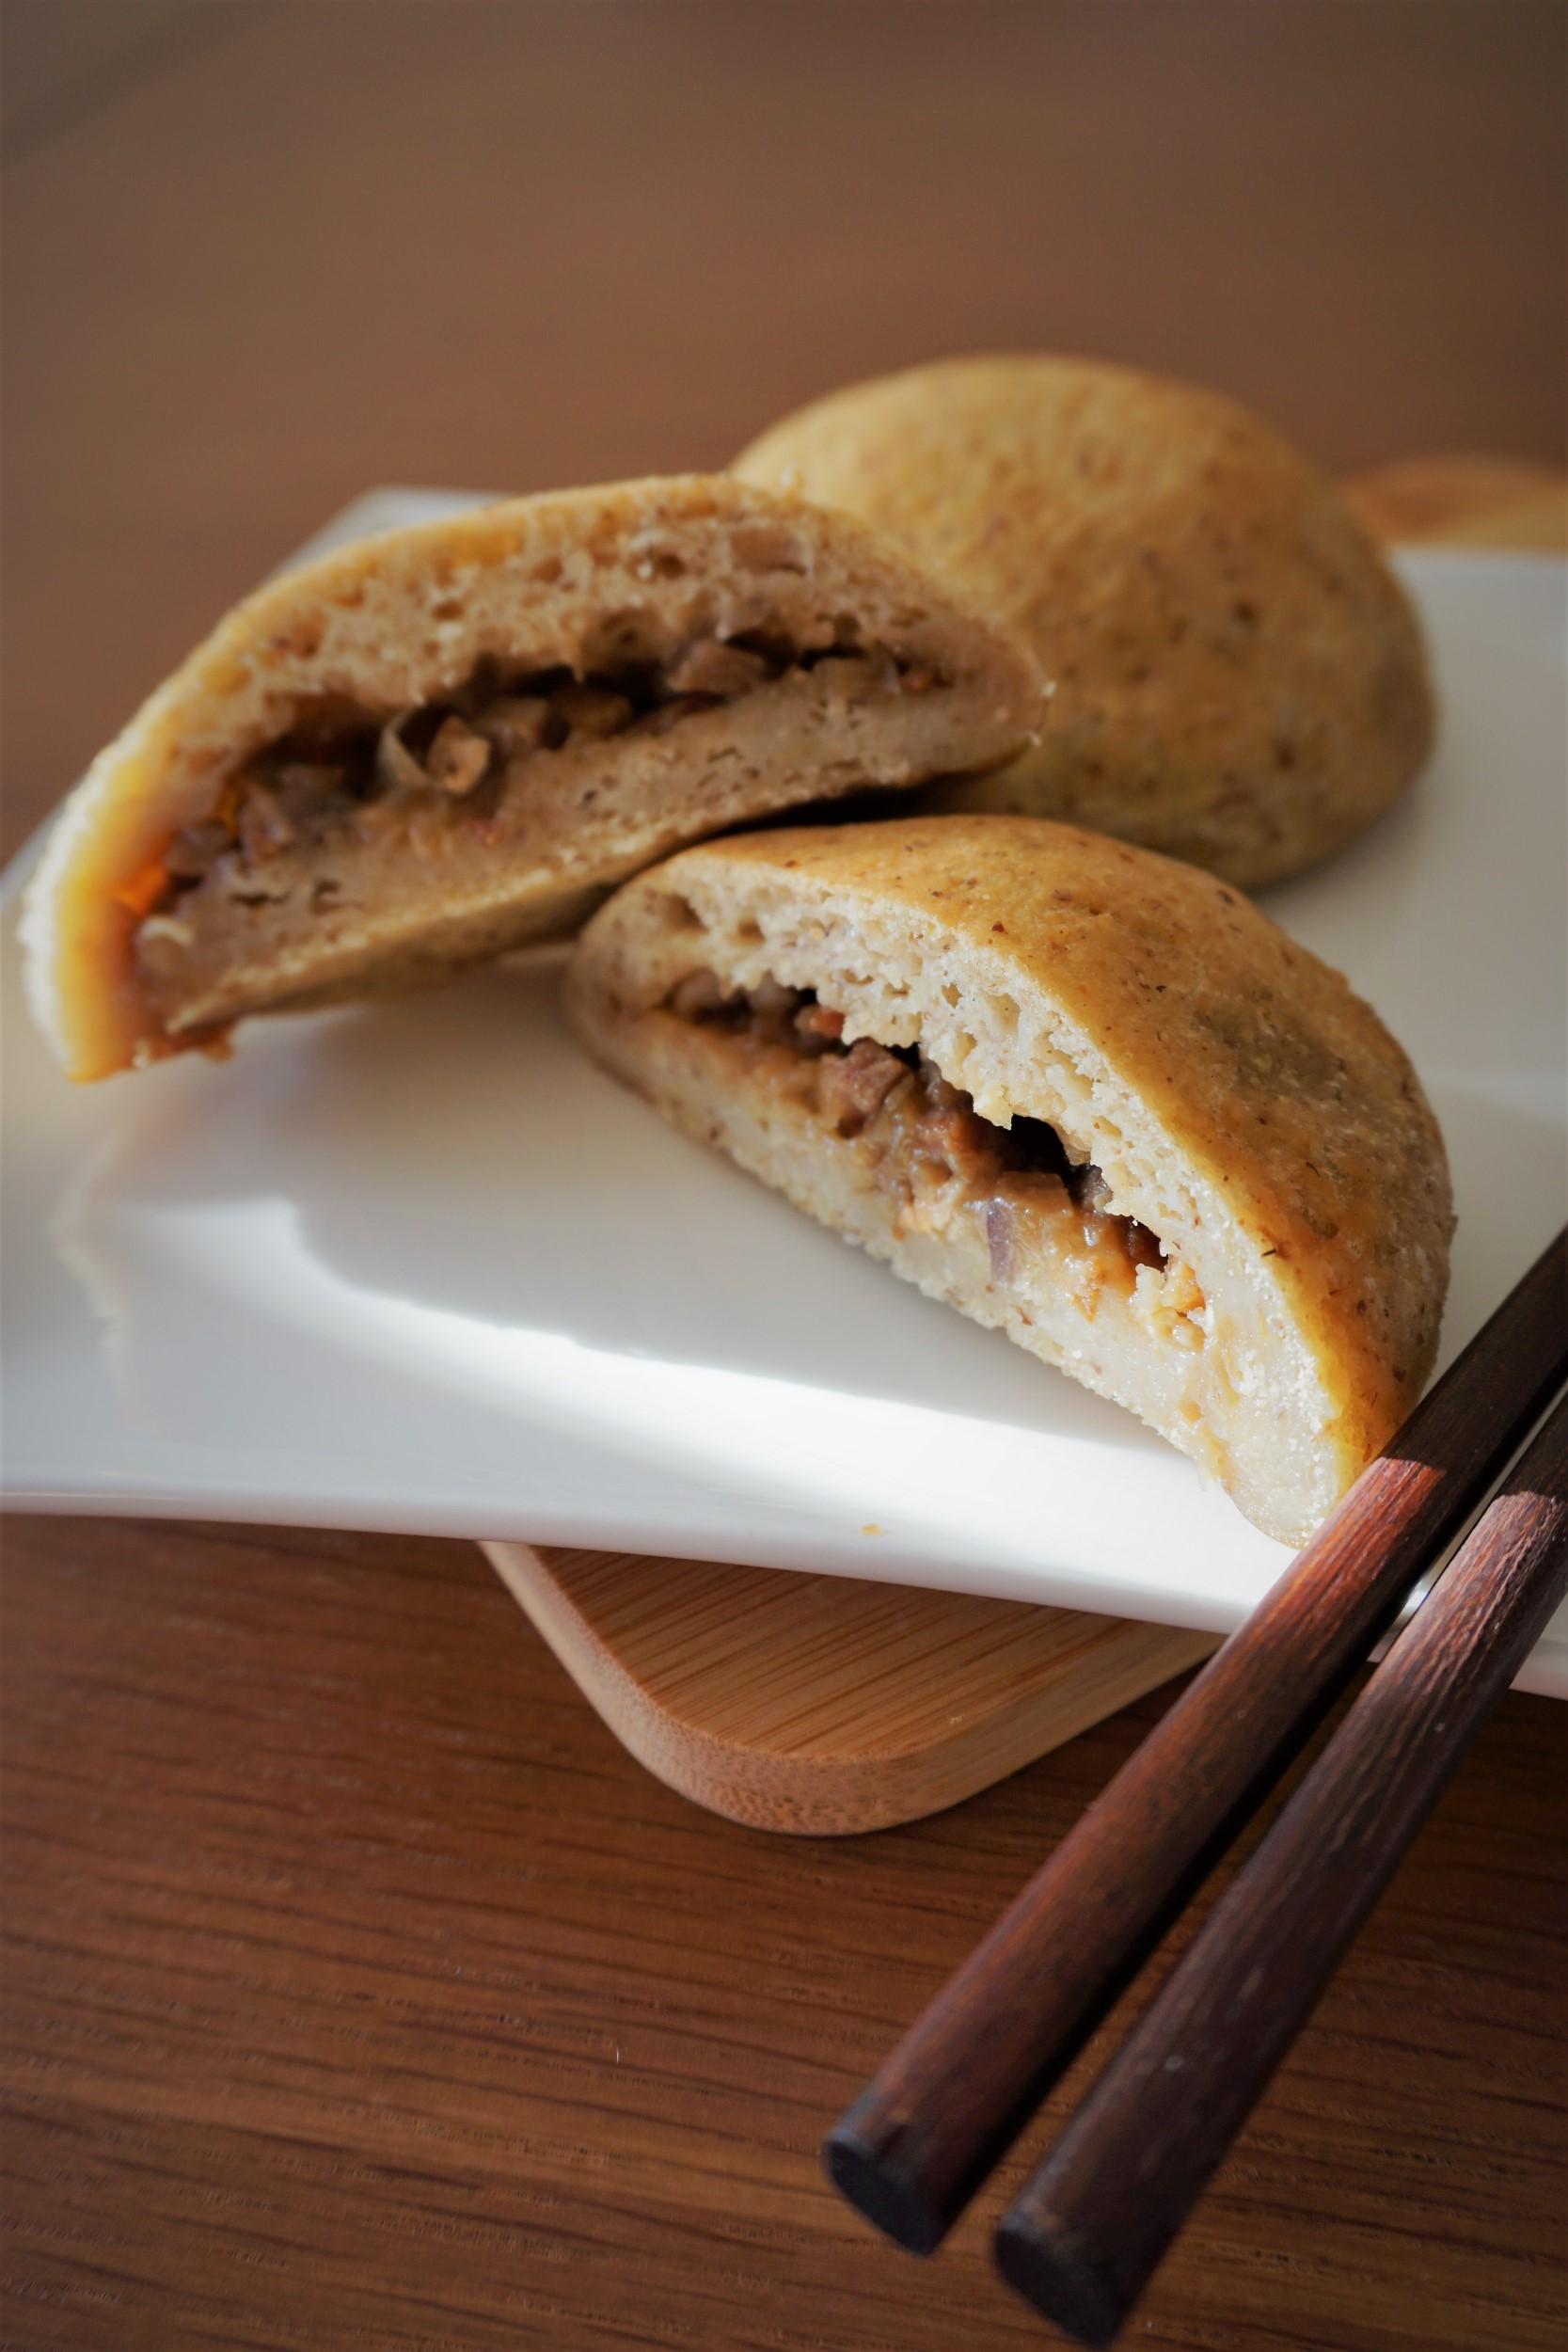 GF sourdough baked BBQ pork buns (char siu bao)